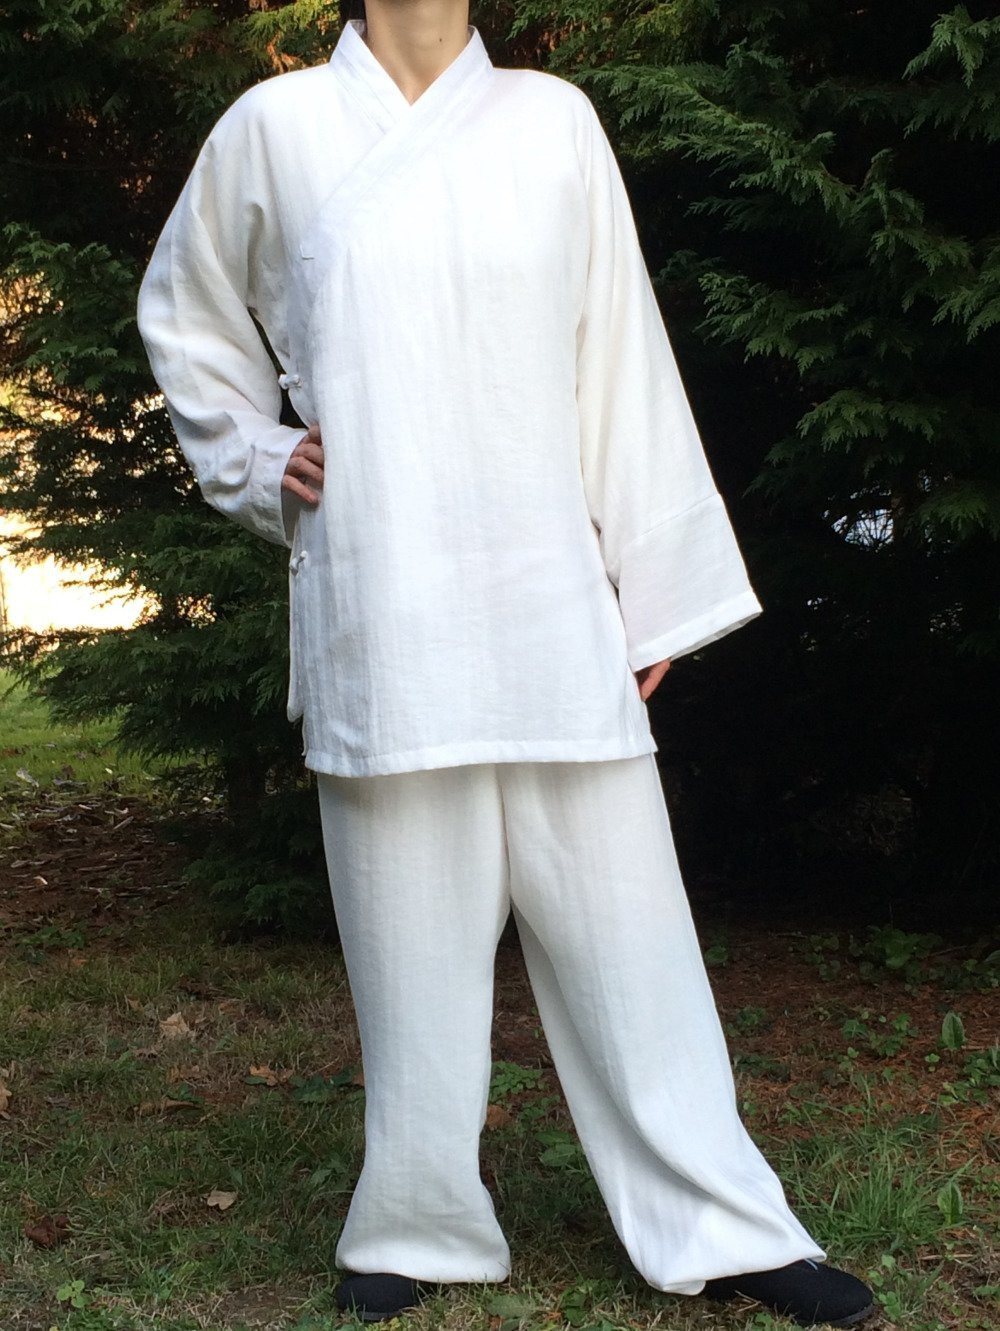 Ensemble blanc, vêtements Tai Chi Chuan, Qi Gong, Kung Fu Homme ou Femme